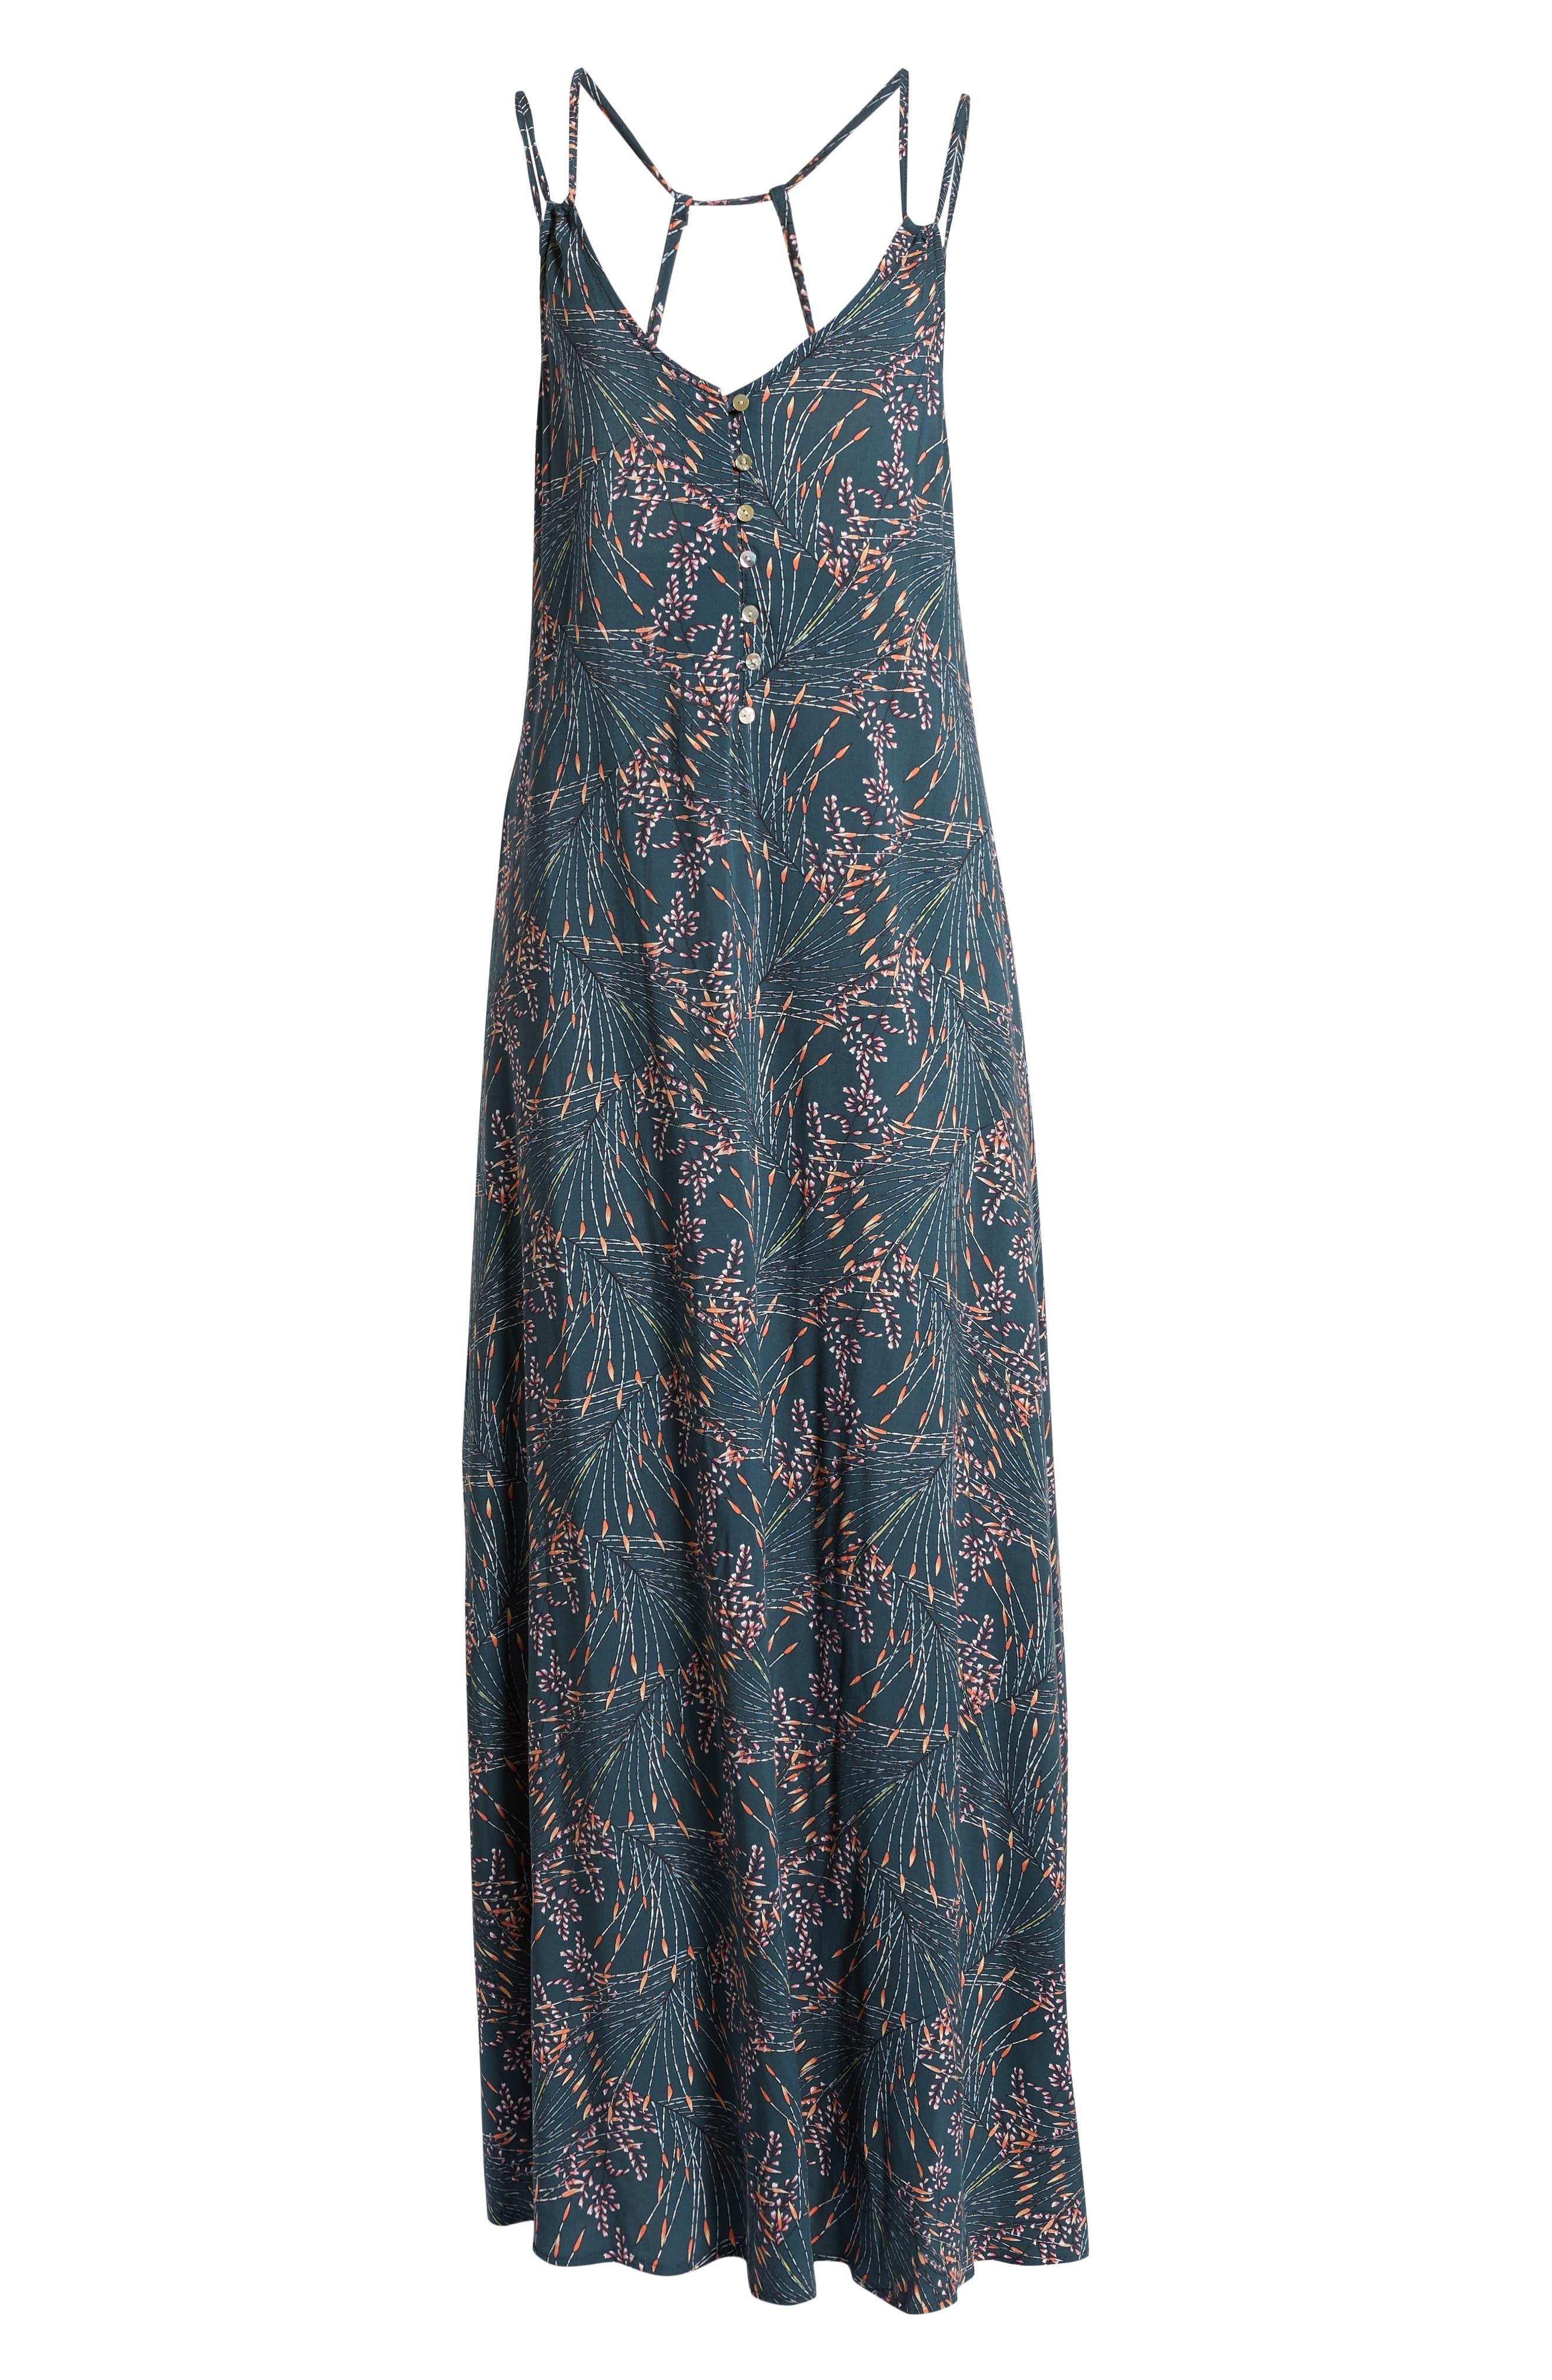 O'NEILL,                             Breanna Maxi Dress,                             Alternate thumbnail 7, color,                             STARGAZER